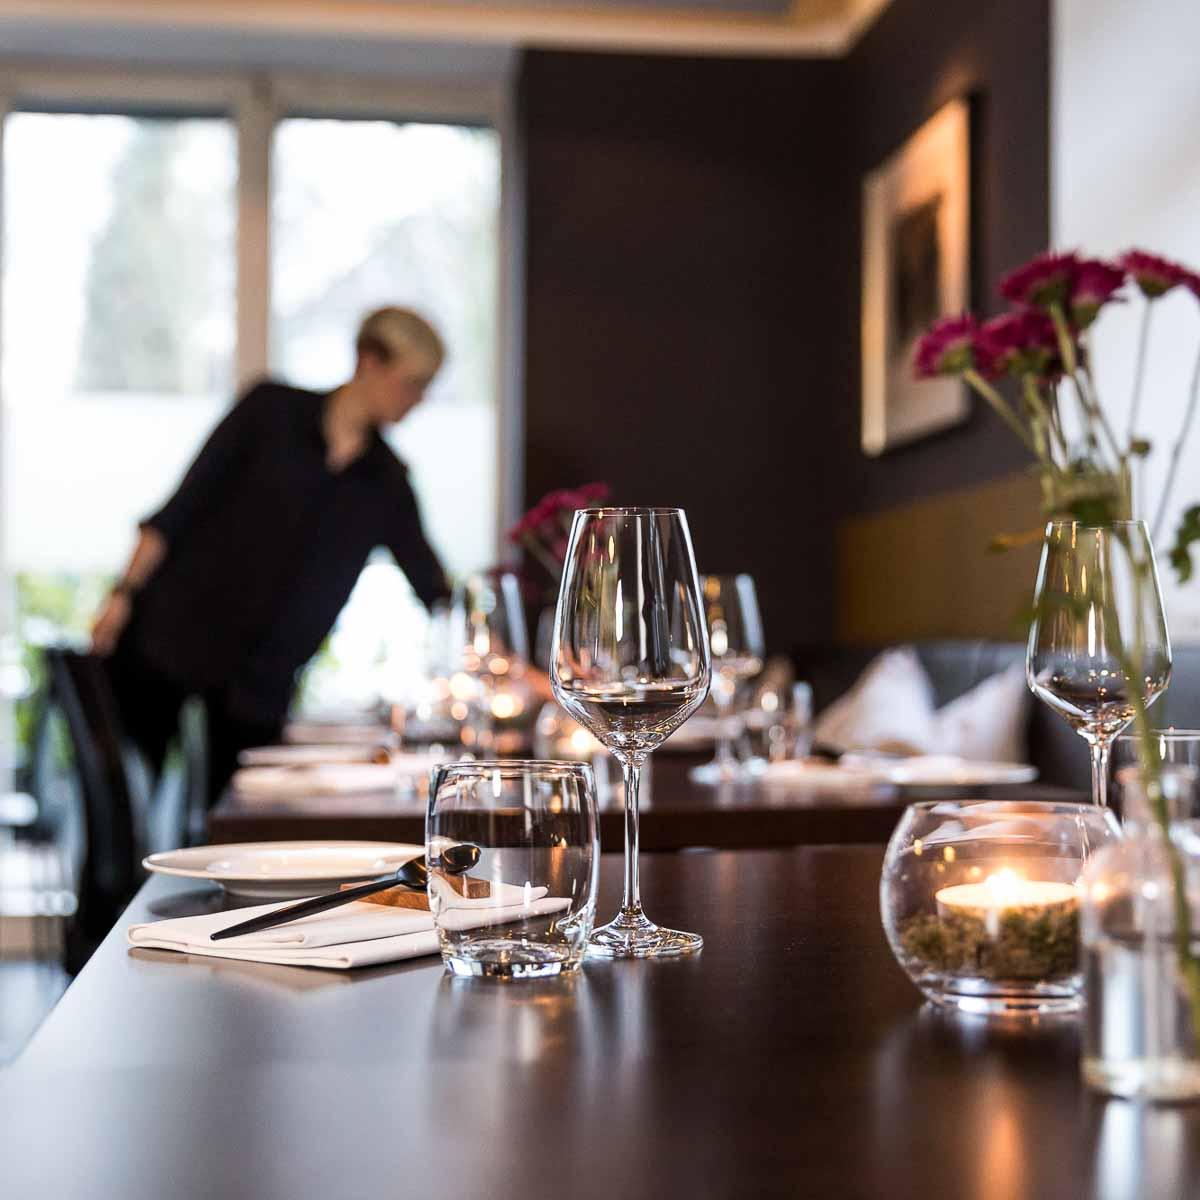 Restaurant Zeik in Hamburg Winterhude